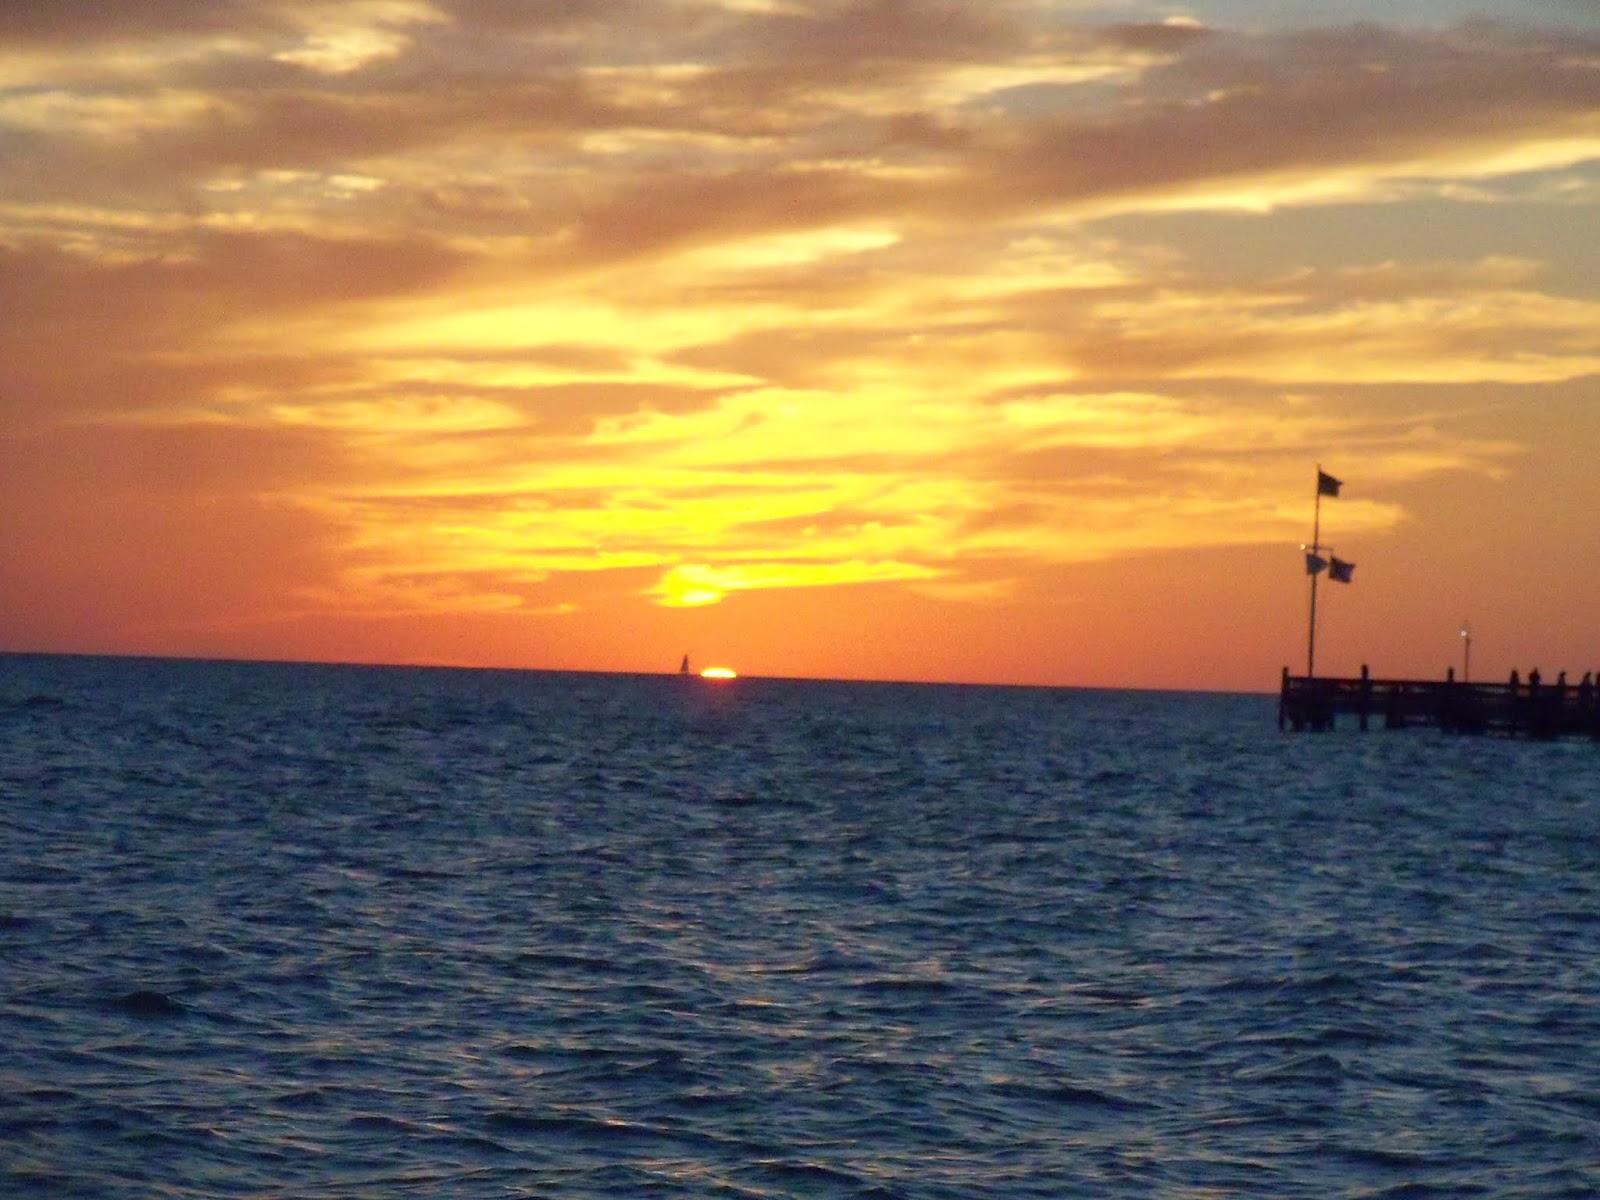 Key West Vacation - 116_5614.JPG